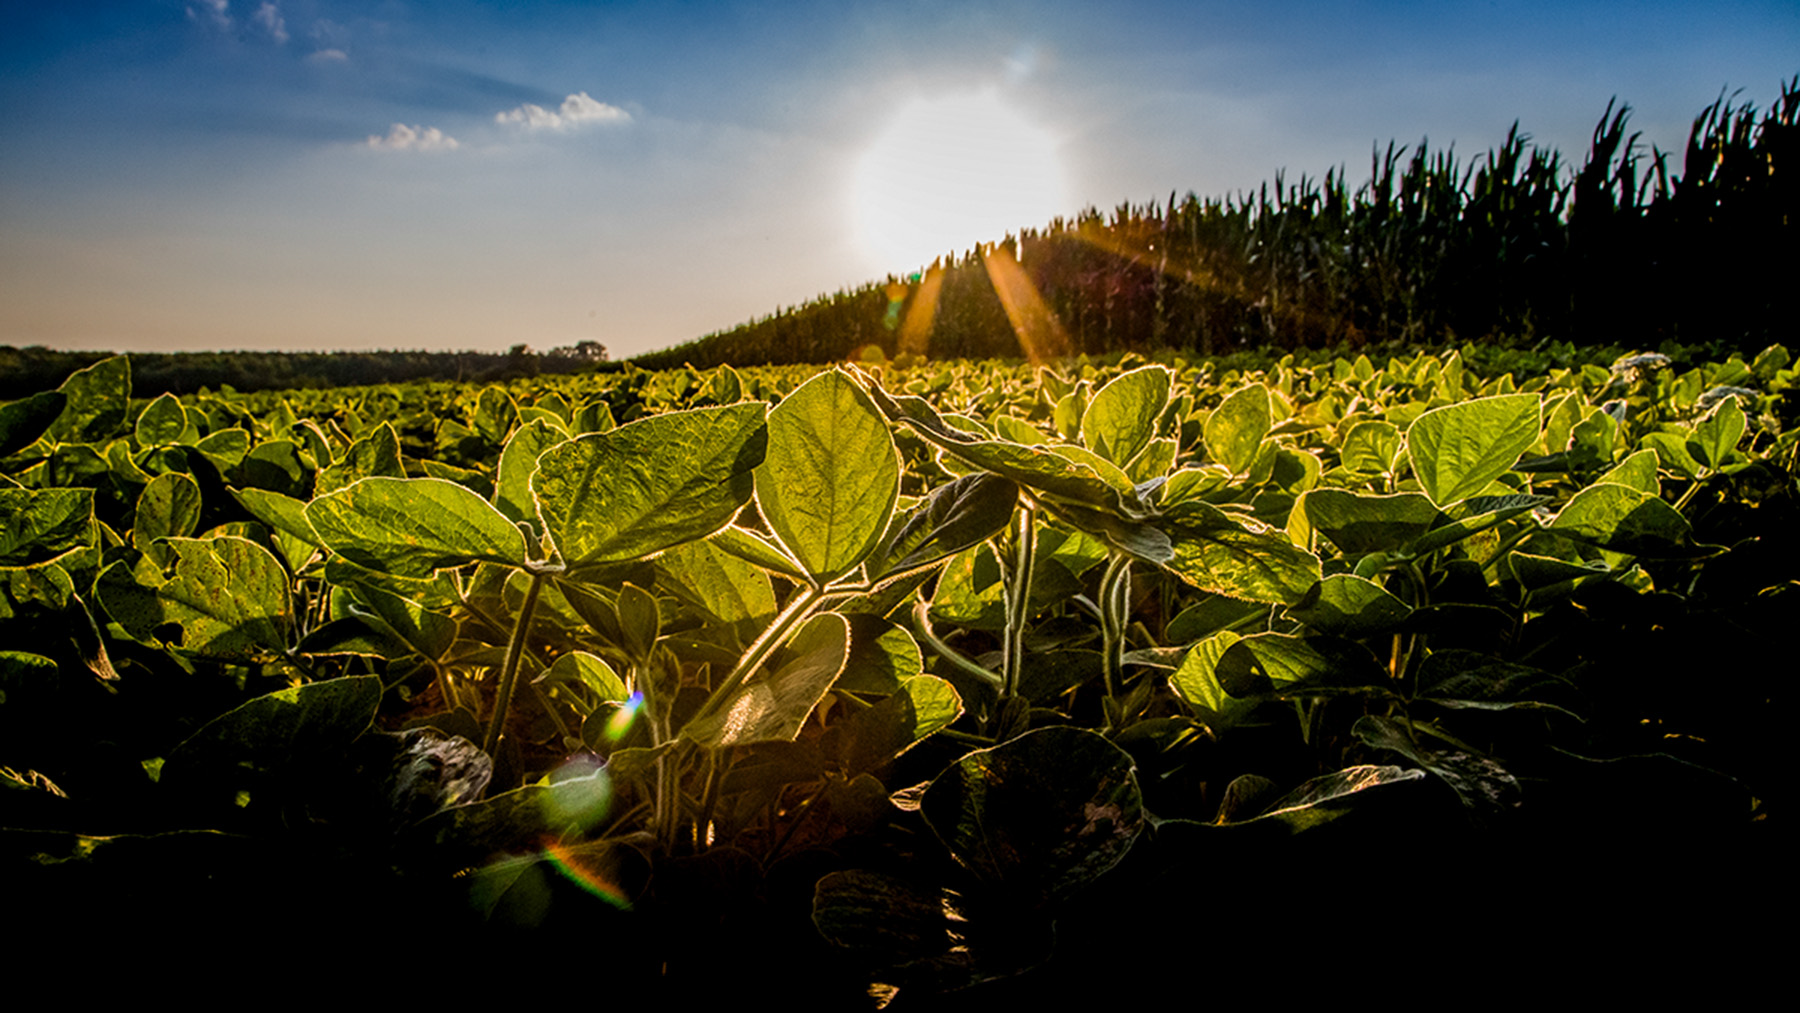 soybean crops in the sun